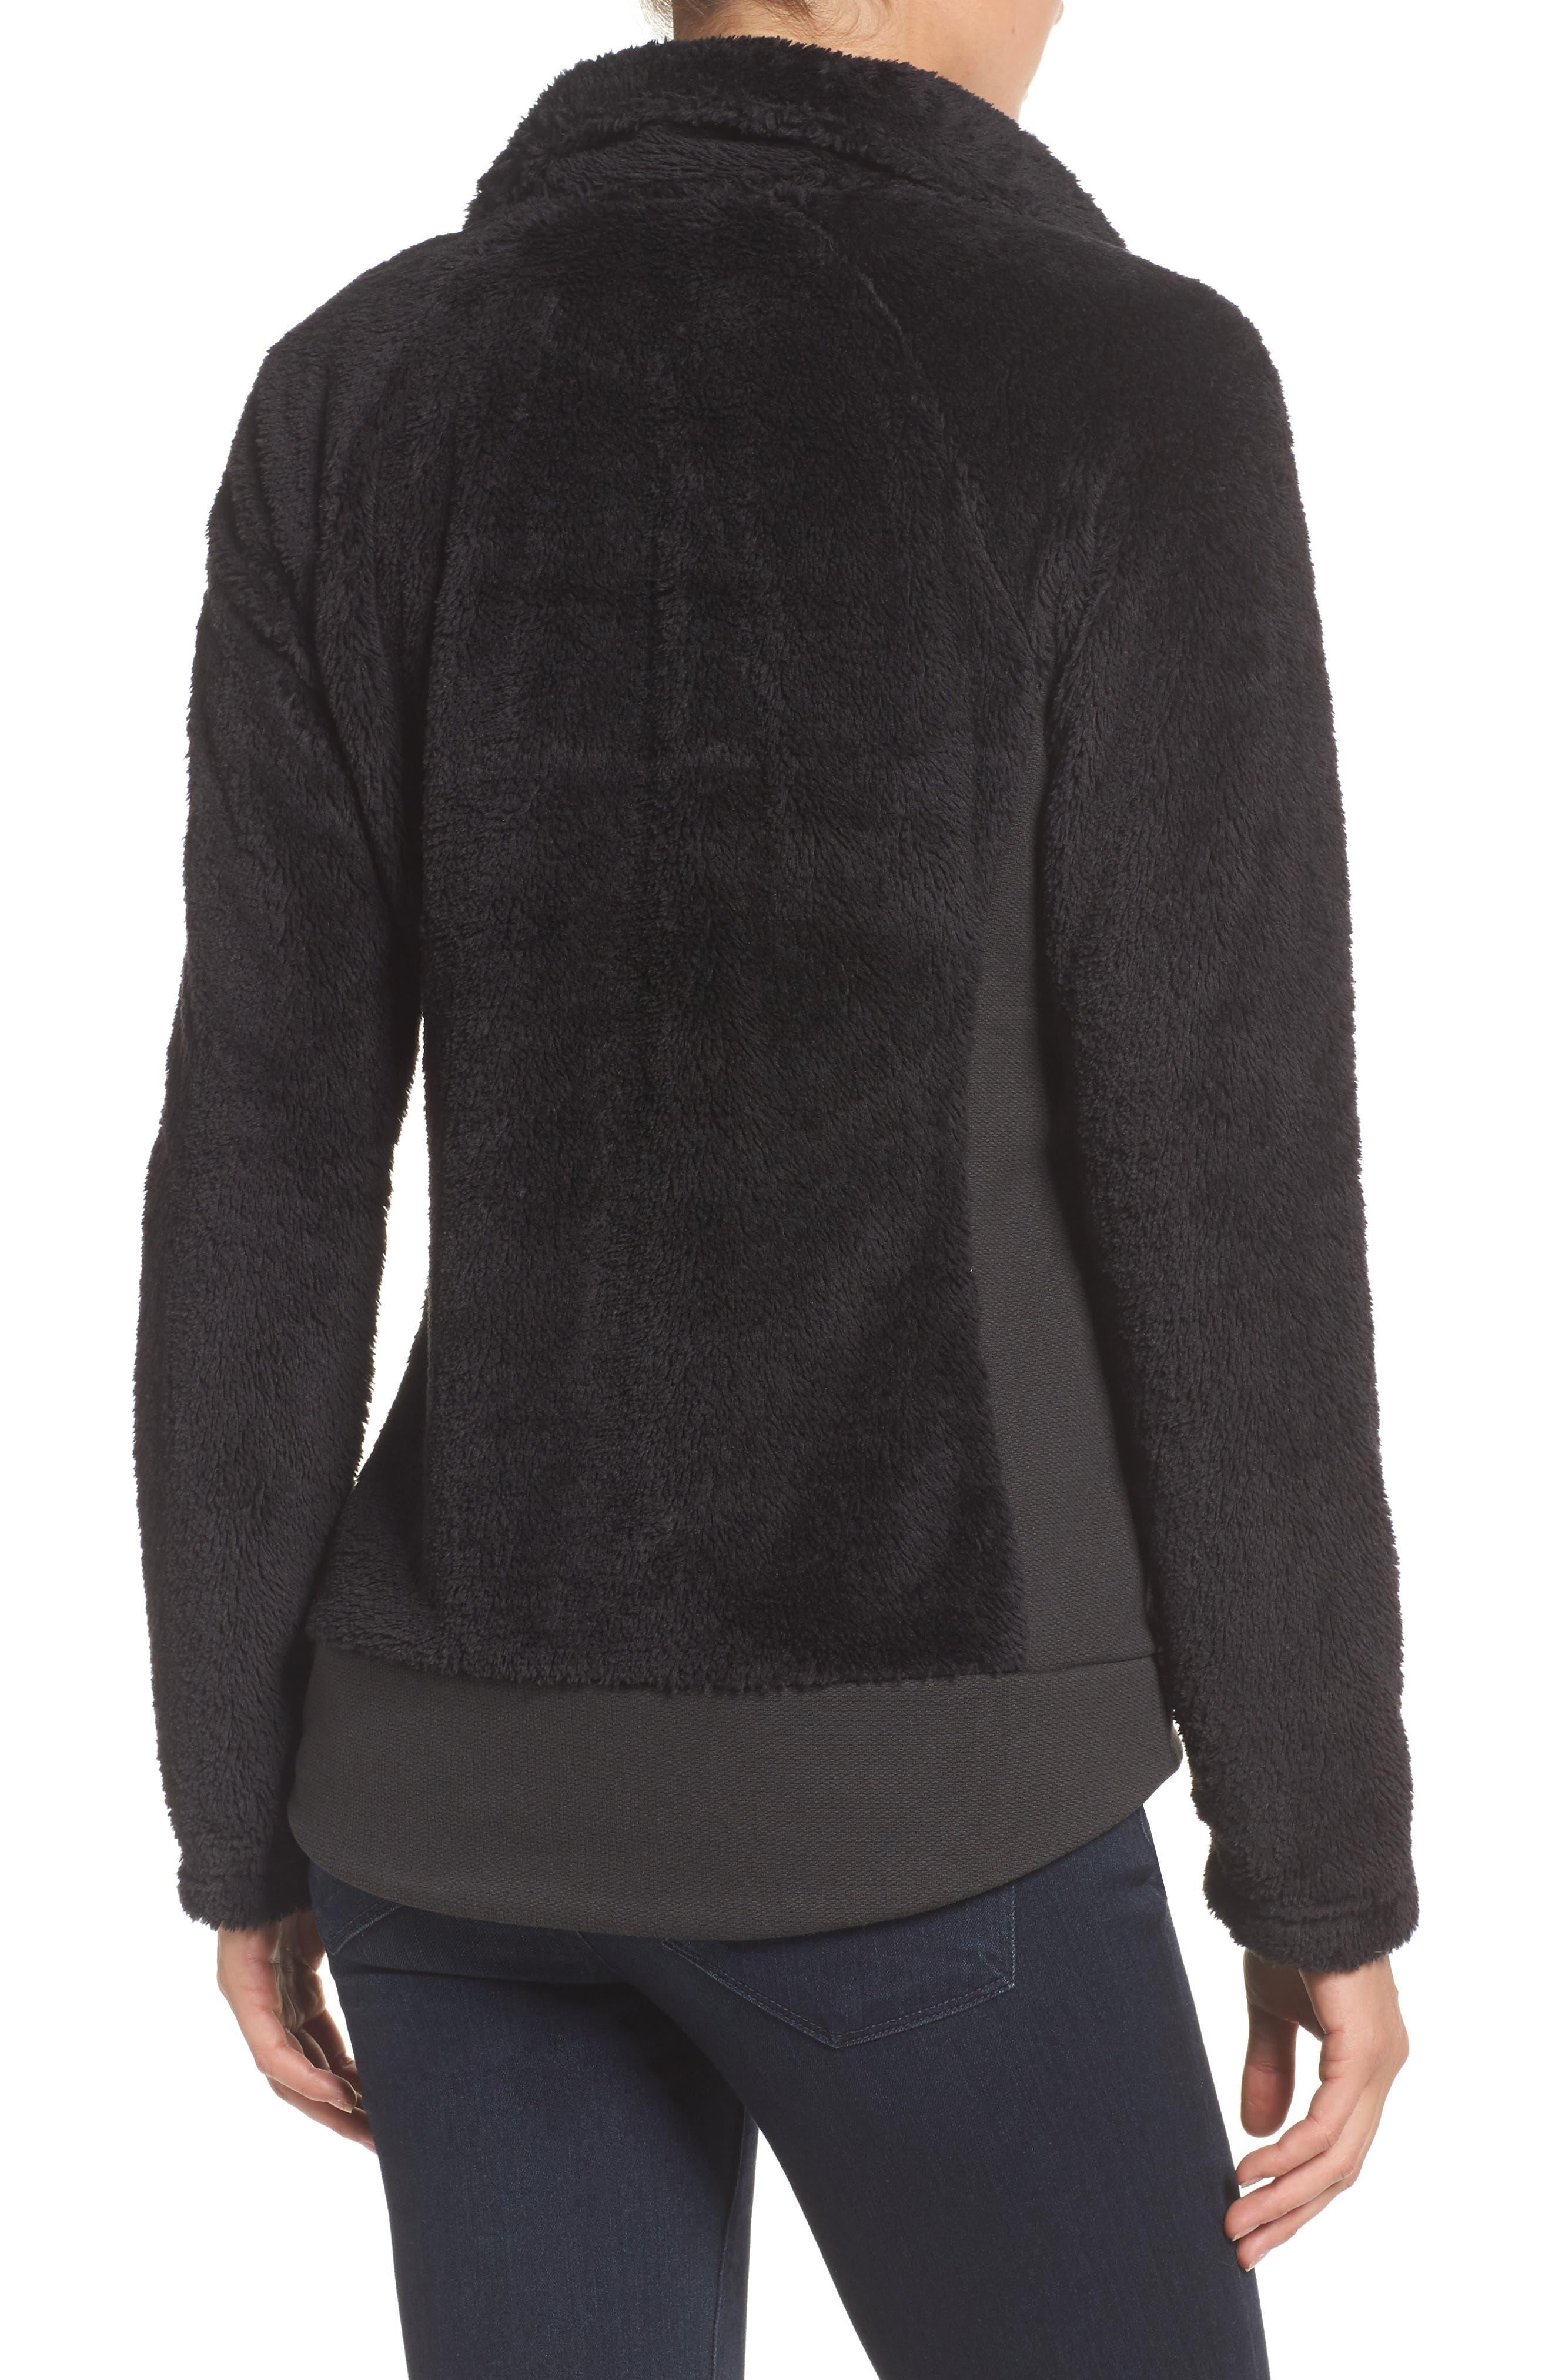 THE NORTH FACE, Furry Fleece Jacket, Alternate thumbnail 2, color, TNF BLACK